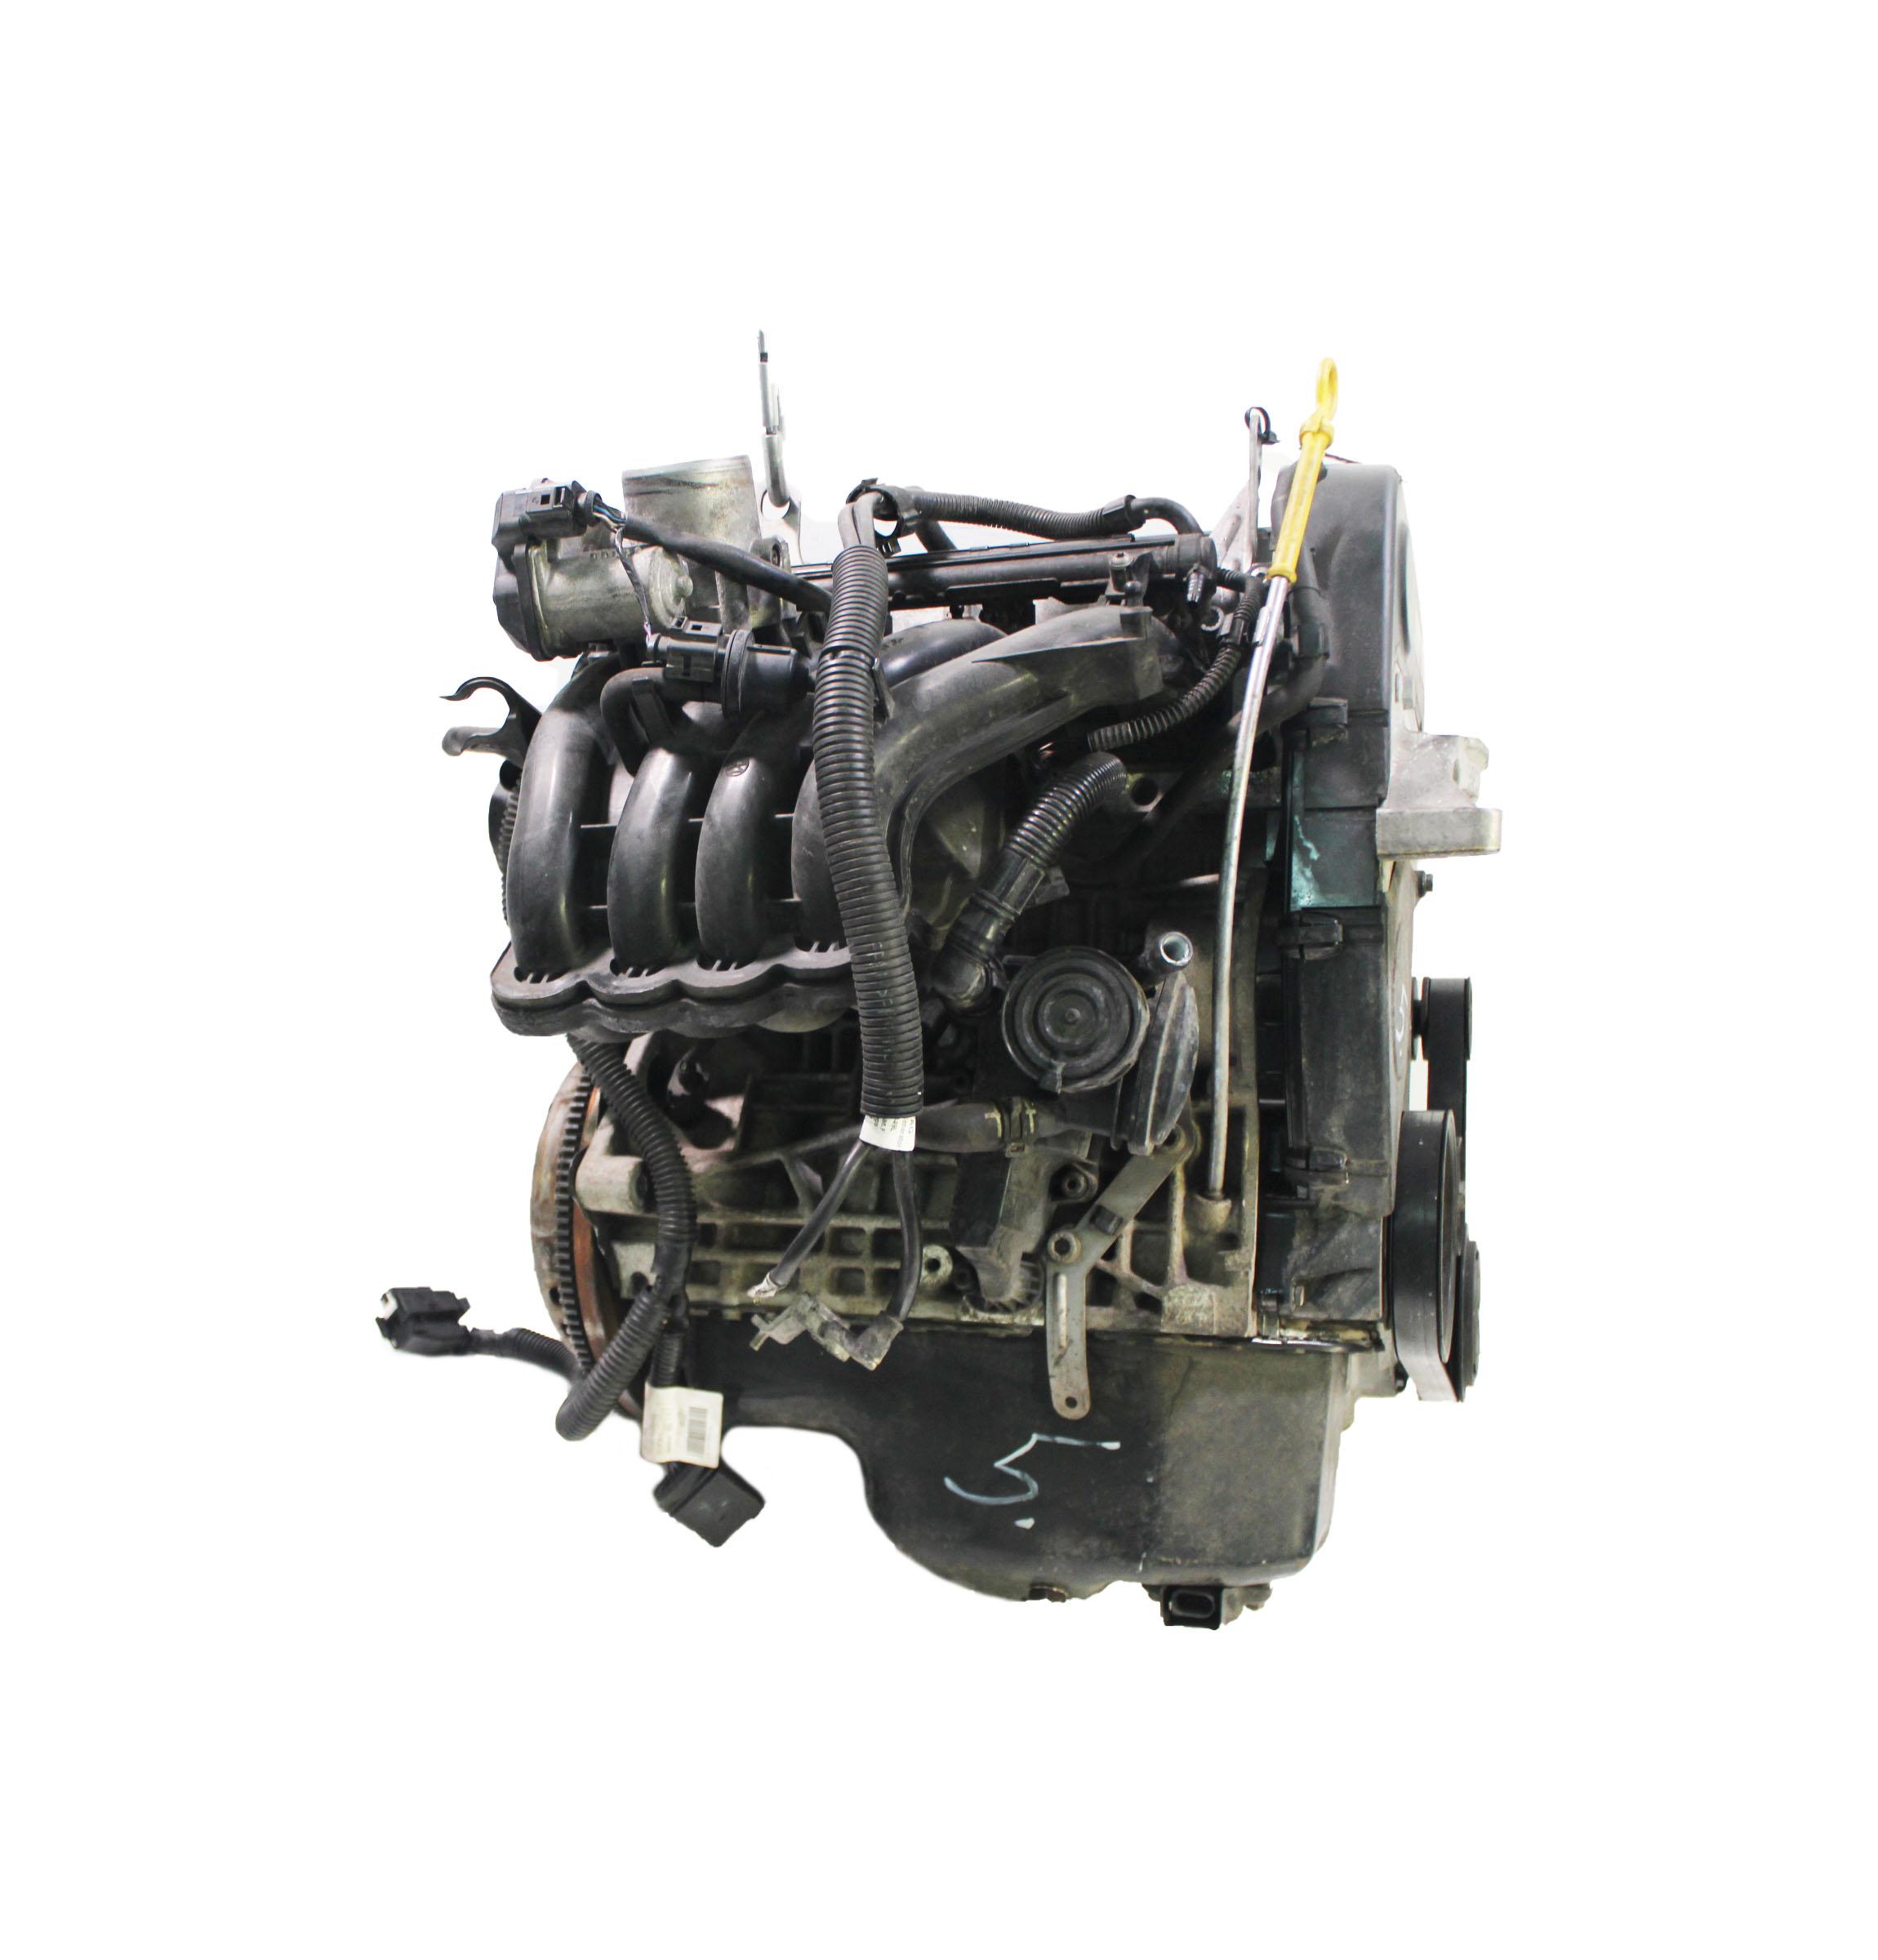 Motor für Seat Ibiza 6J 1,4 Benzin CGG CGGB 85 PS